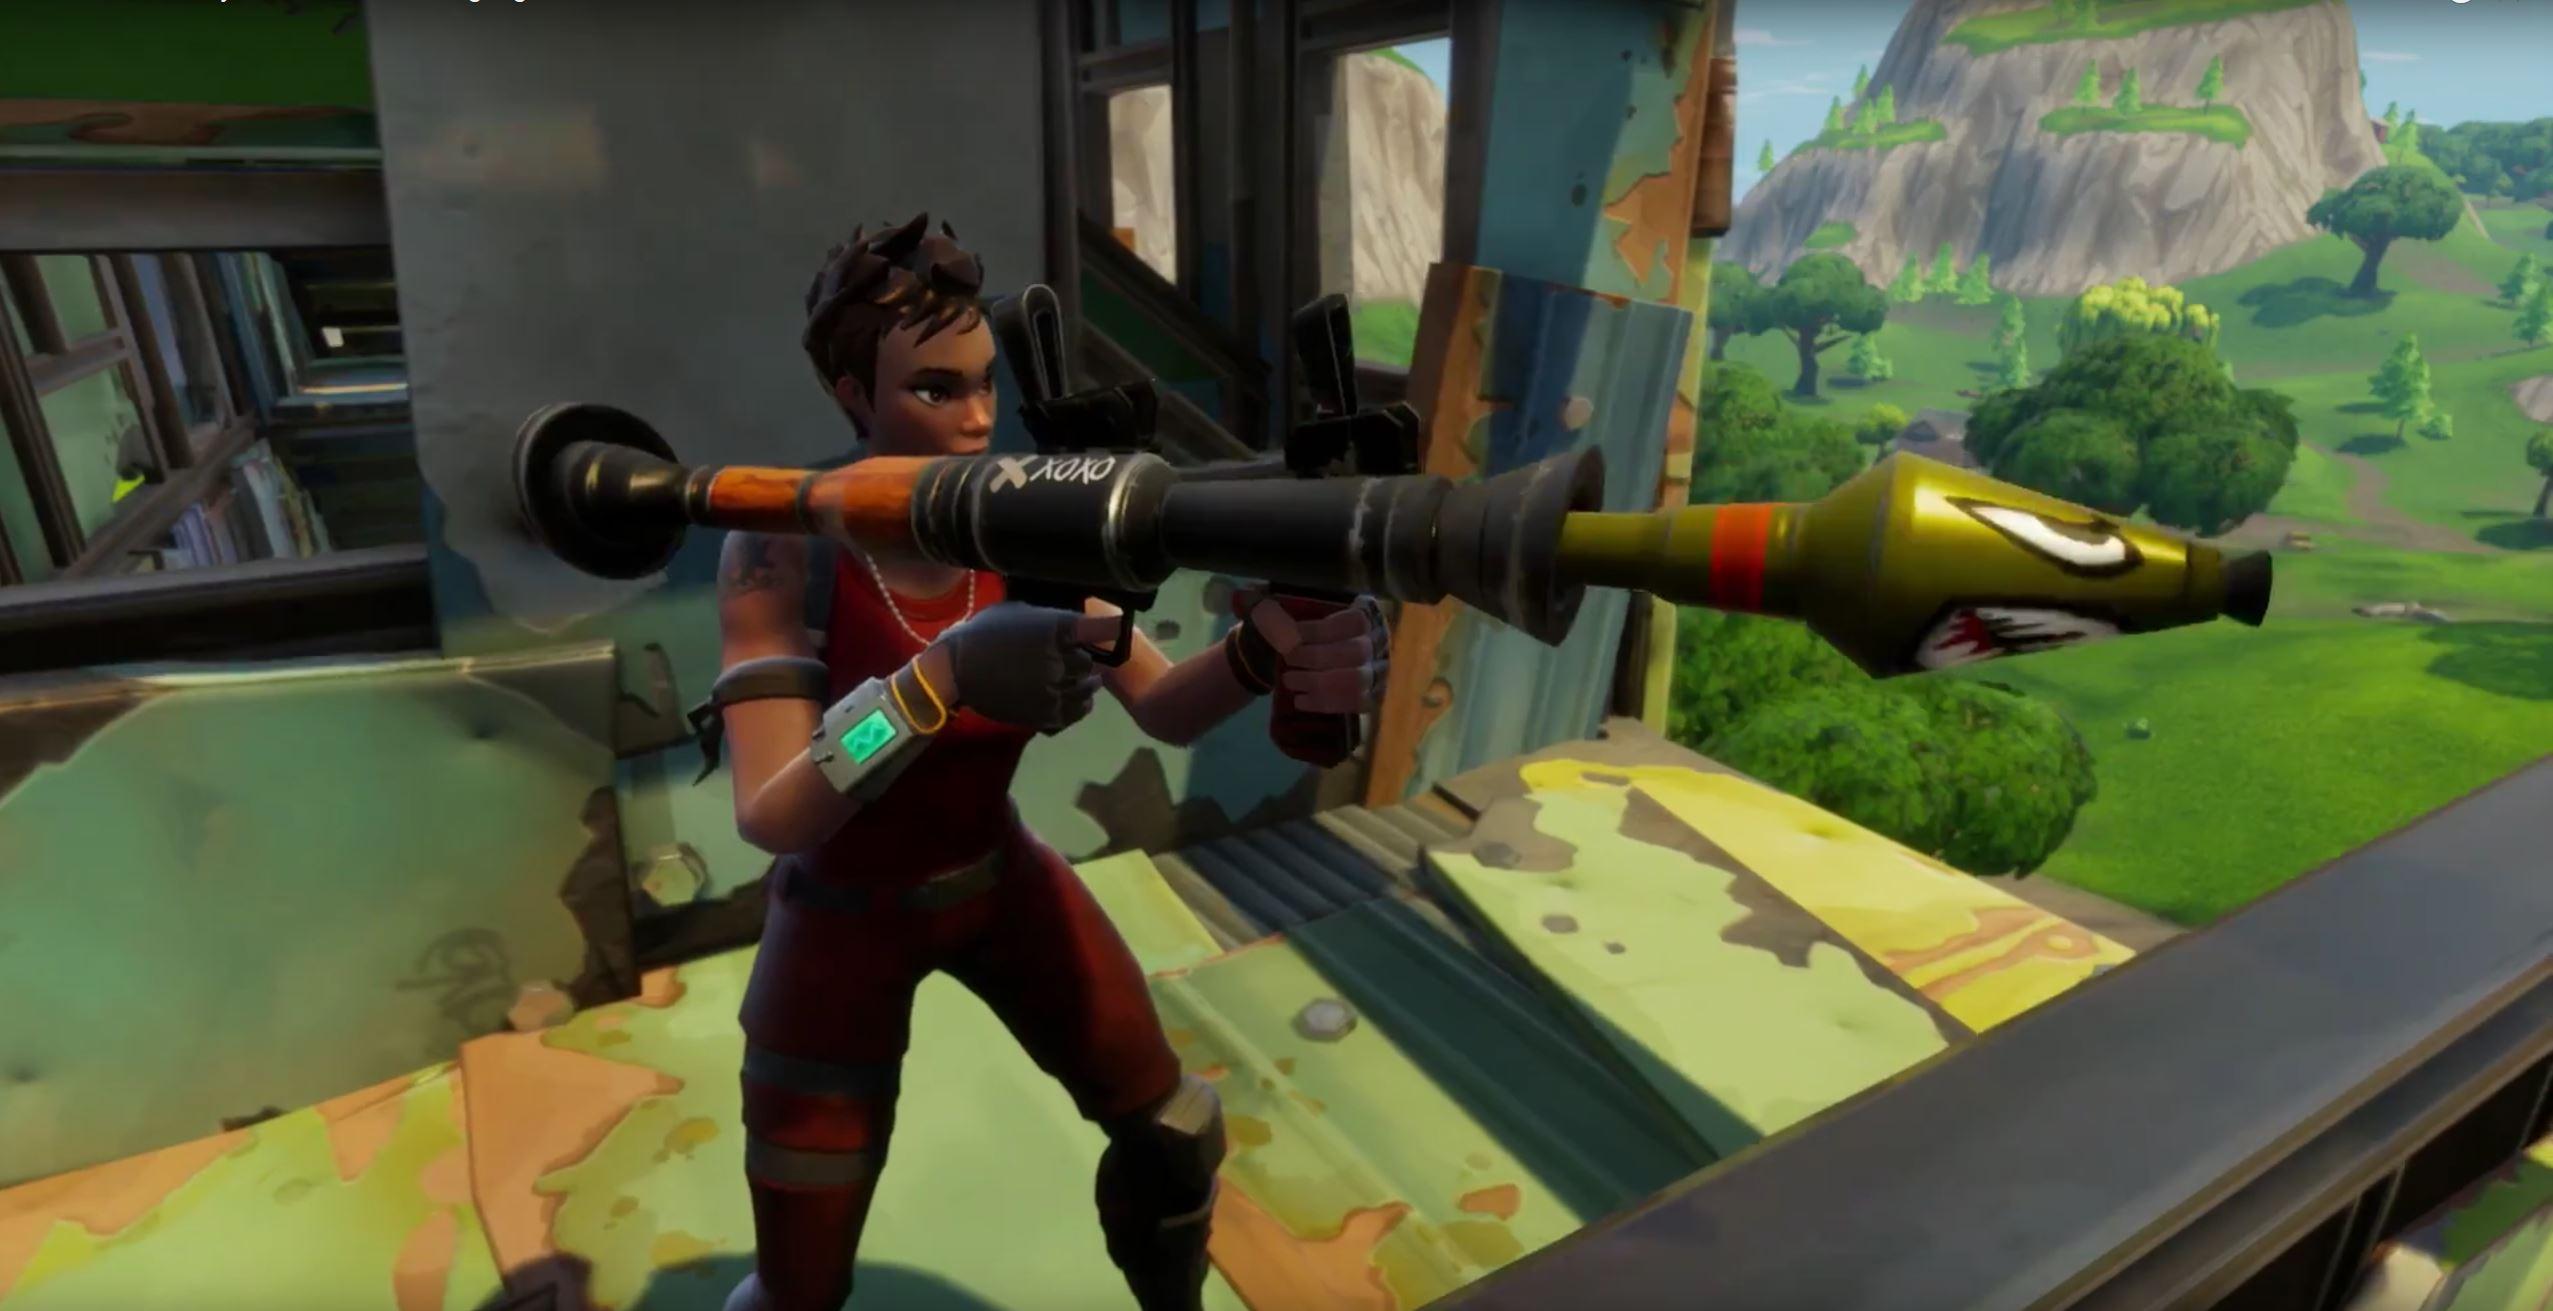 Fortnite: Spieler verdienen Crossplay zwischen PS4 & Xbox One